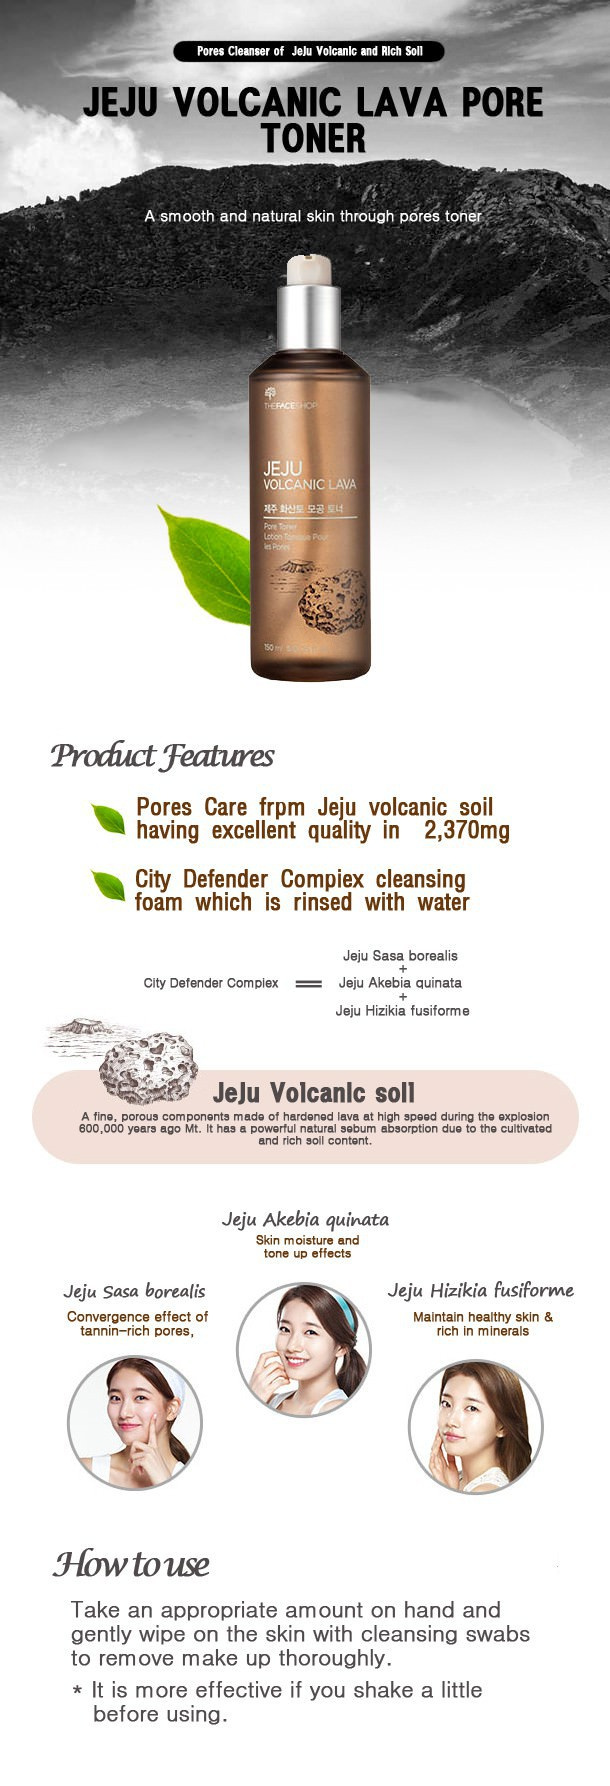 Nước Hoa Hồng Đất Sét và Tro Núi Lửa The Face Shop Jeju Volcanic Lava Pore Toner 150ml